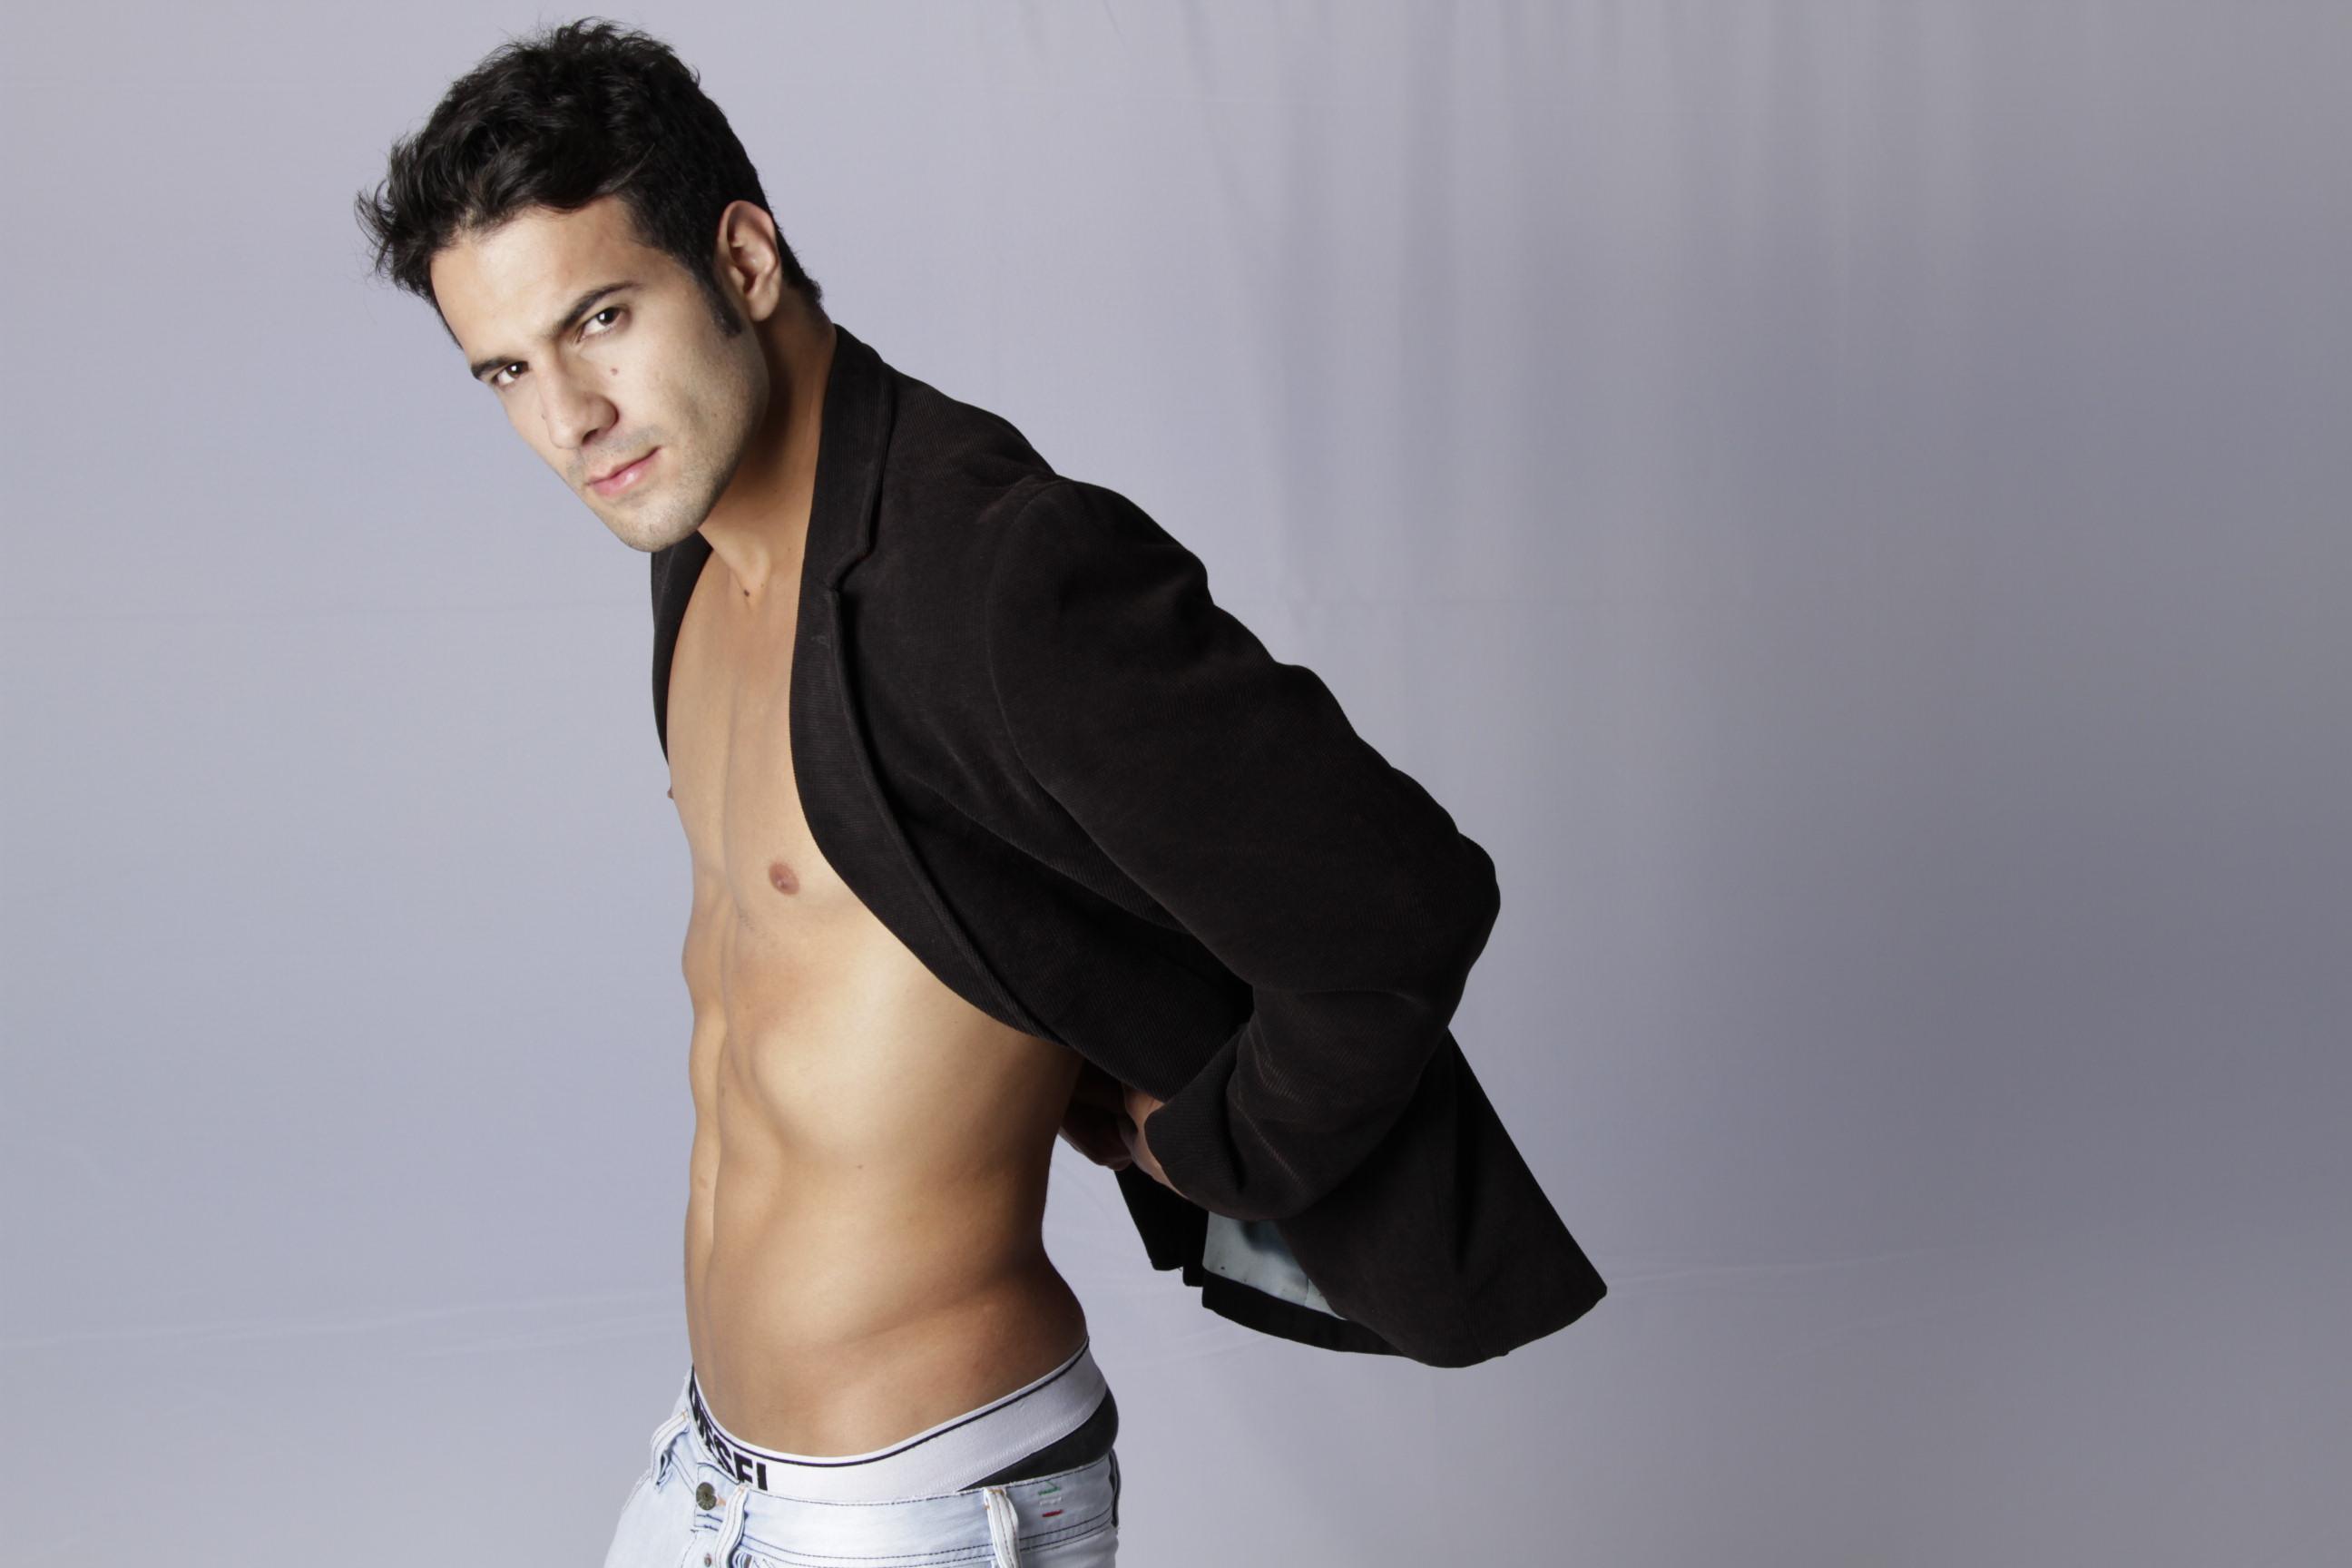 Ricardo Henao